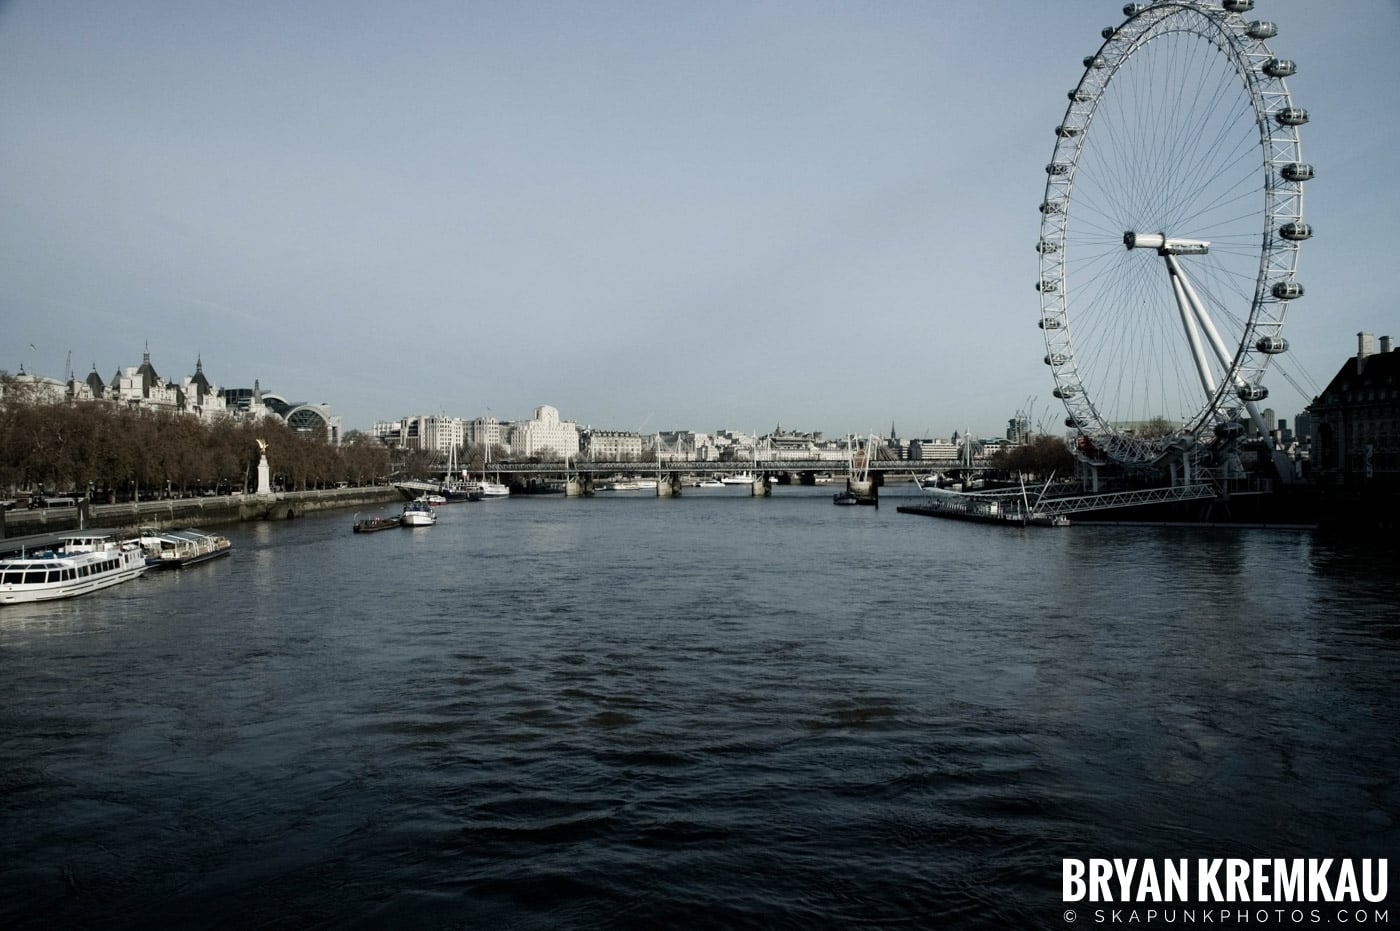 London, England - Day 3 - 12.10.06 (23)